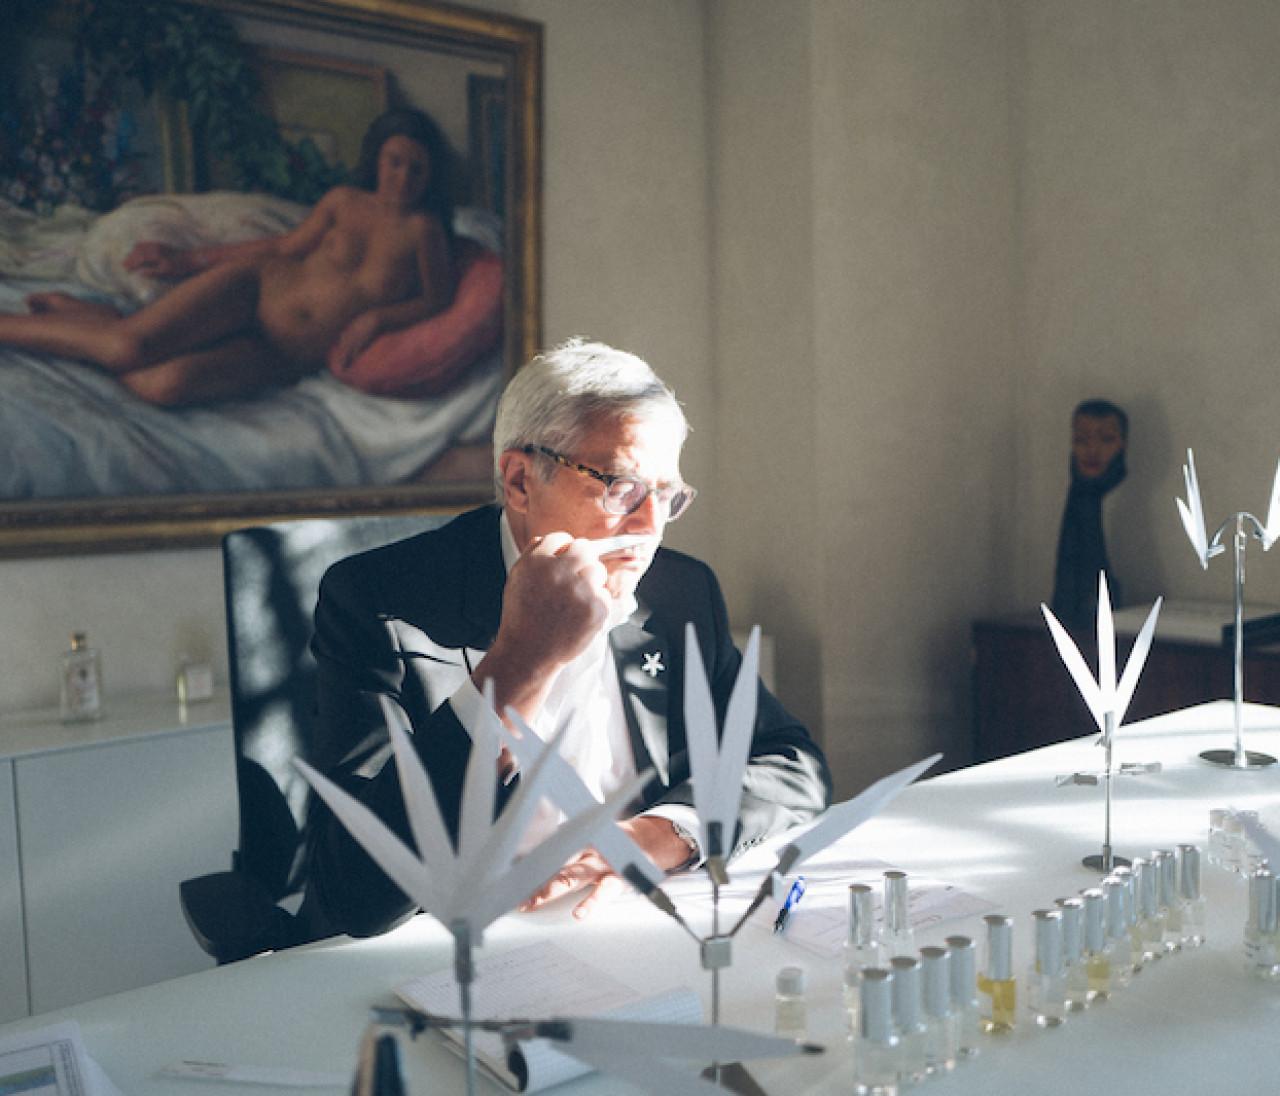 DIORドキュメンタリー映画『NOSE』が公開中! 知られざる調香師の仕事に迫る